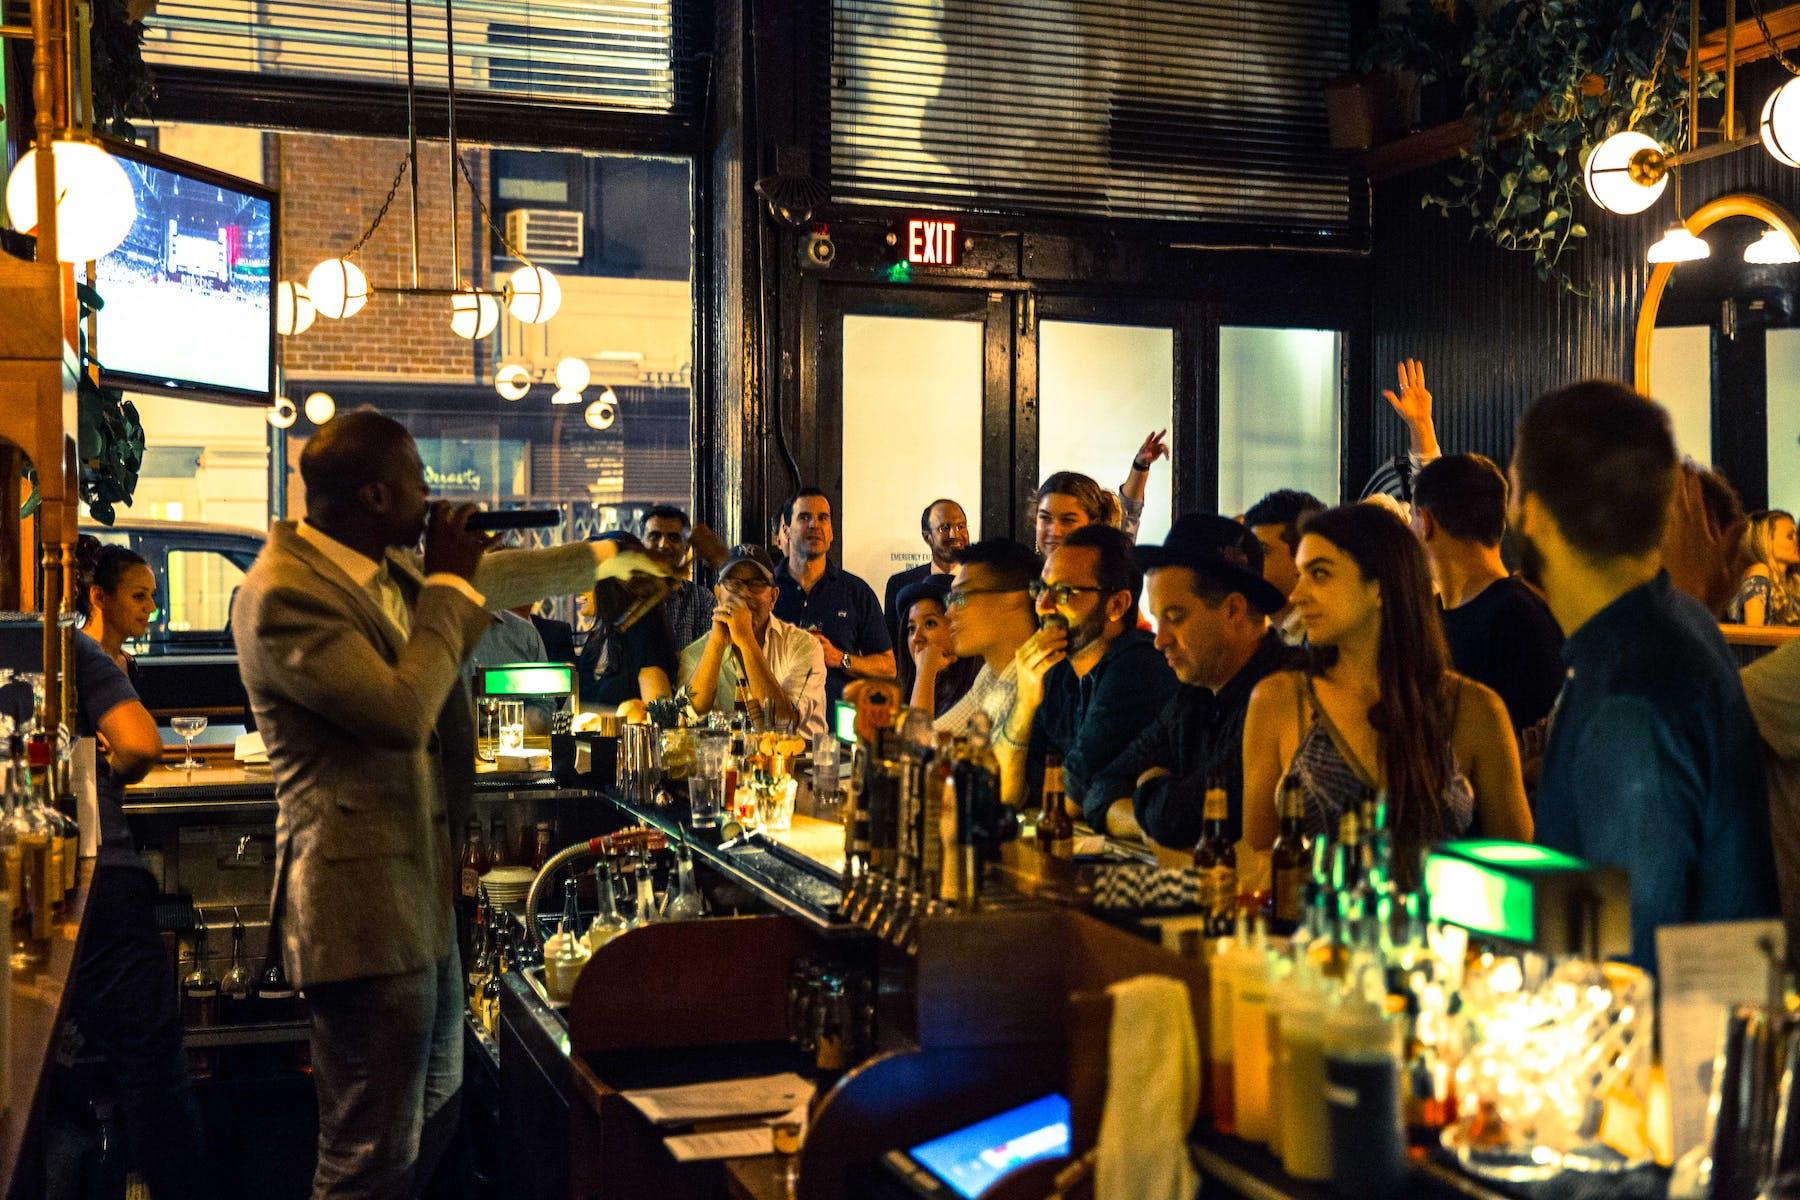 Announcer behind the bar